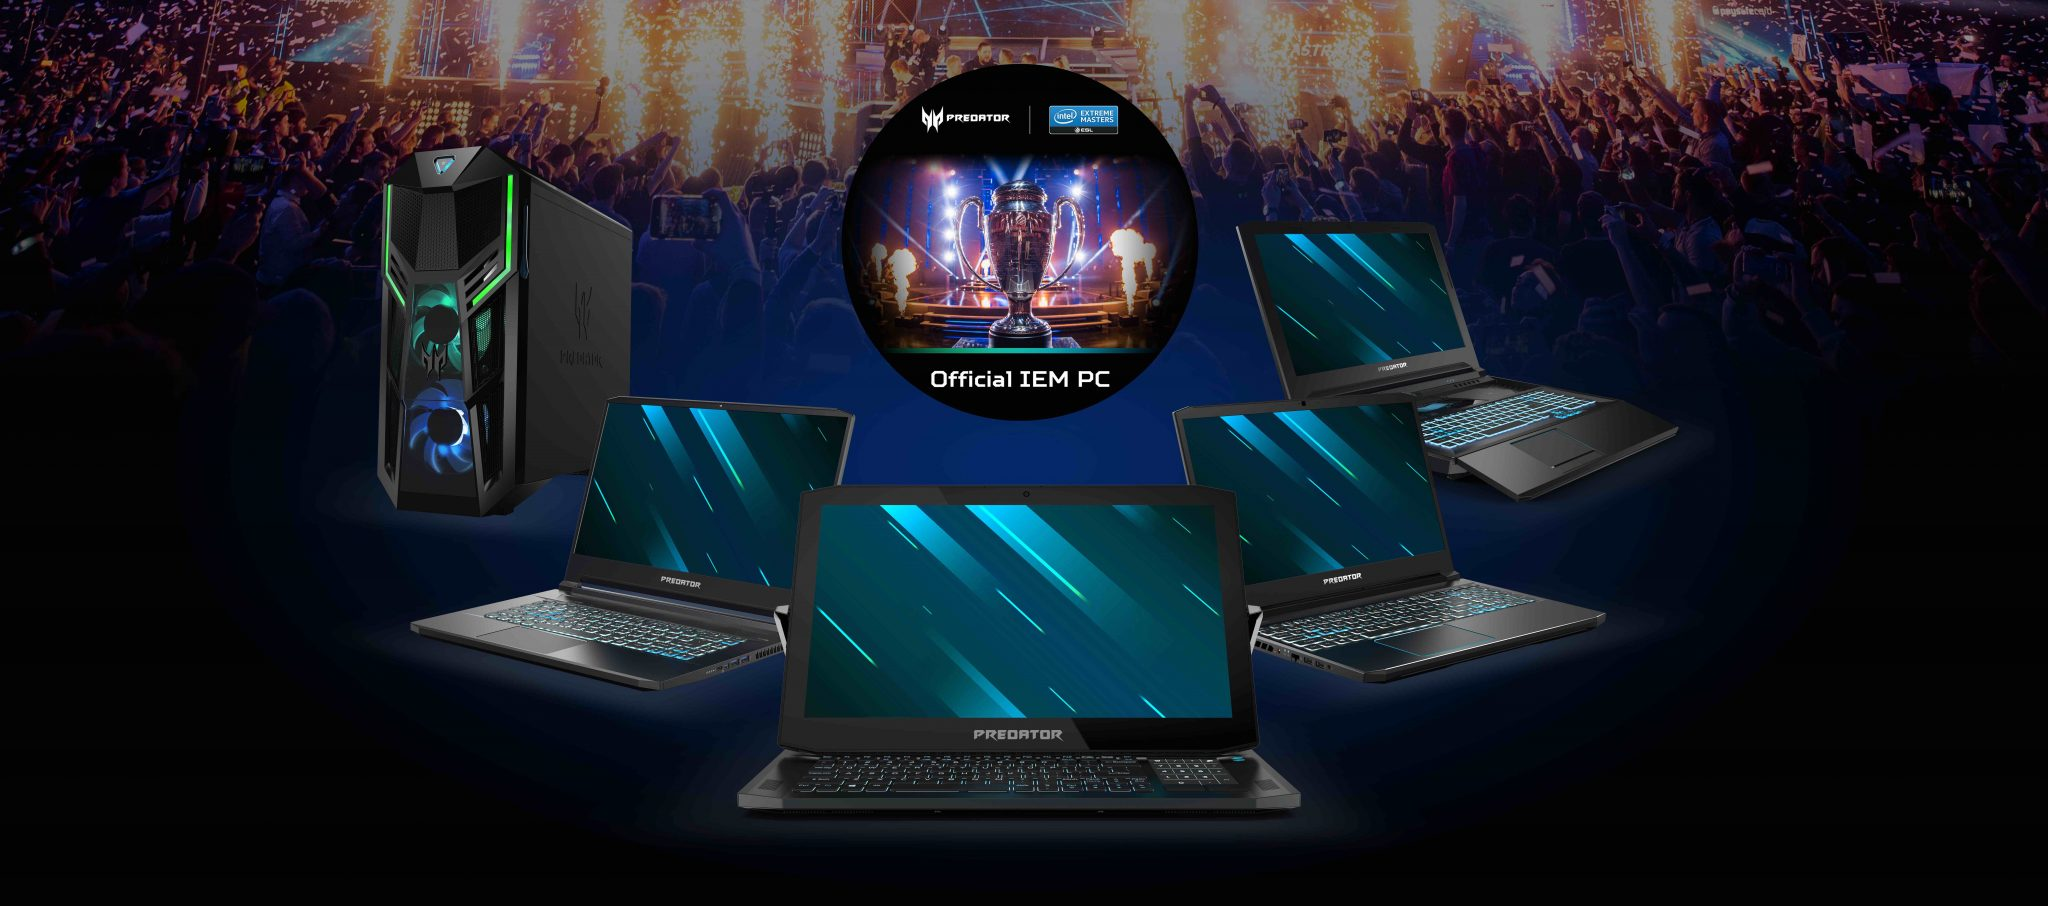 Acer Predator porta l'Intel Extreme Masters (IEM) a Katowice thumbnail